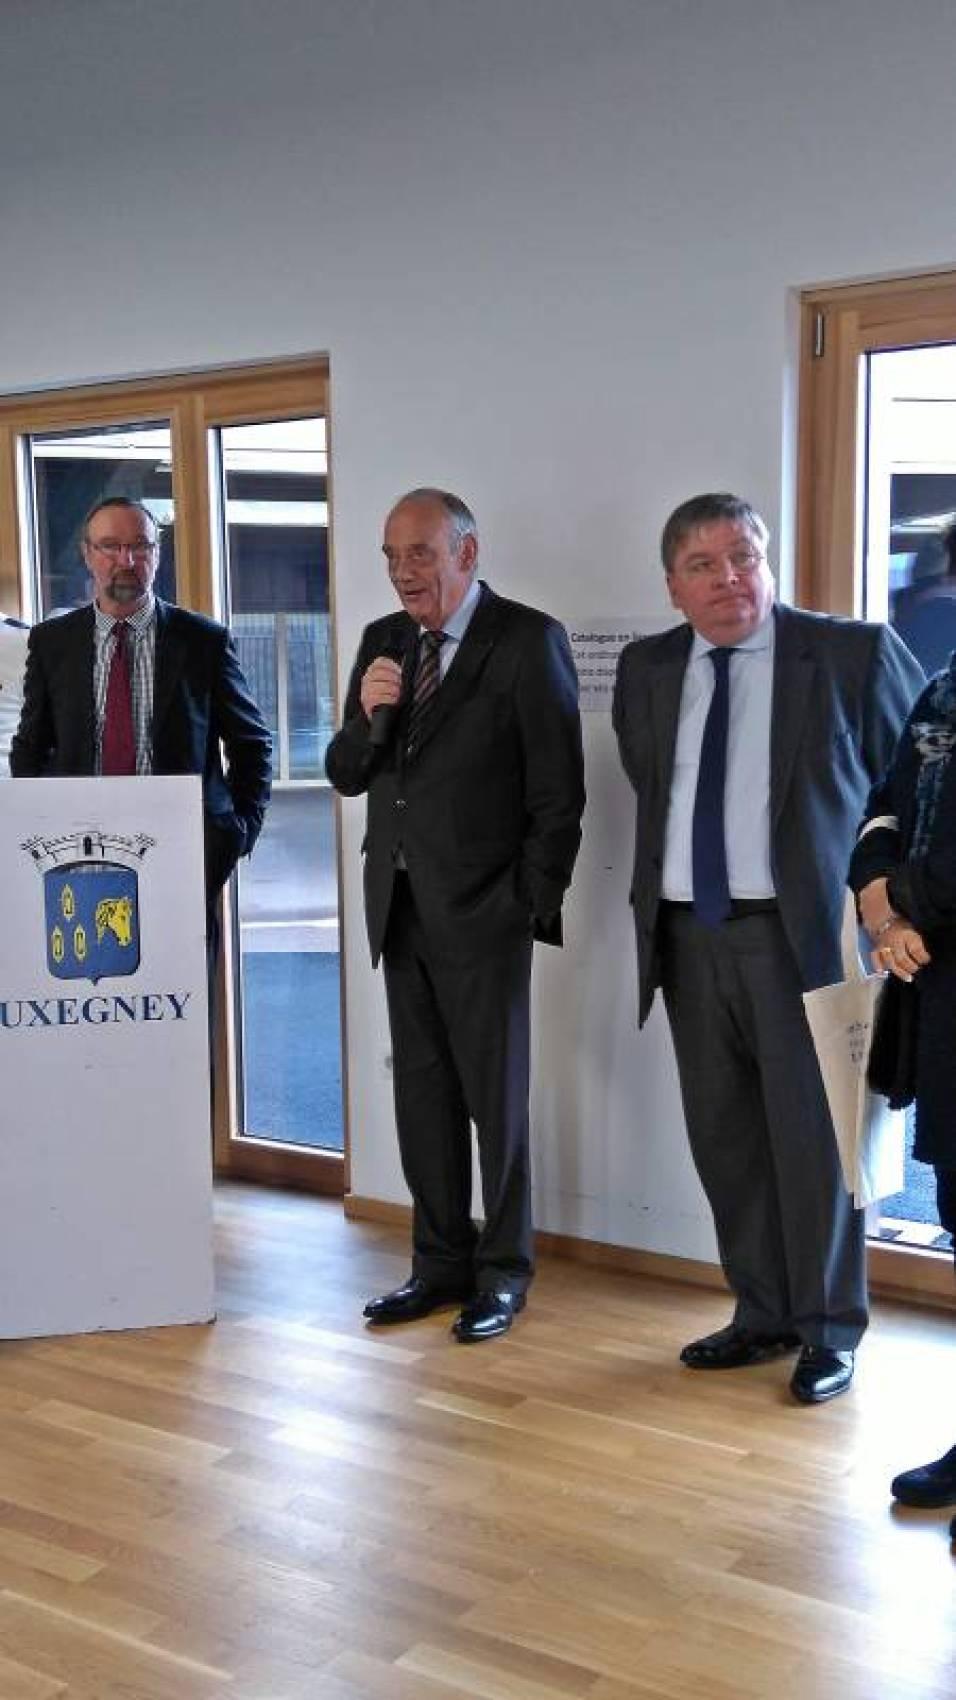 inauguration-médiathèque-Uxegney (5)